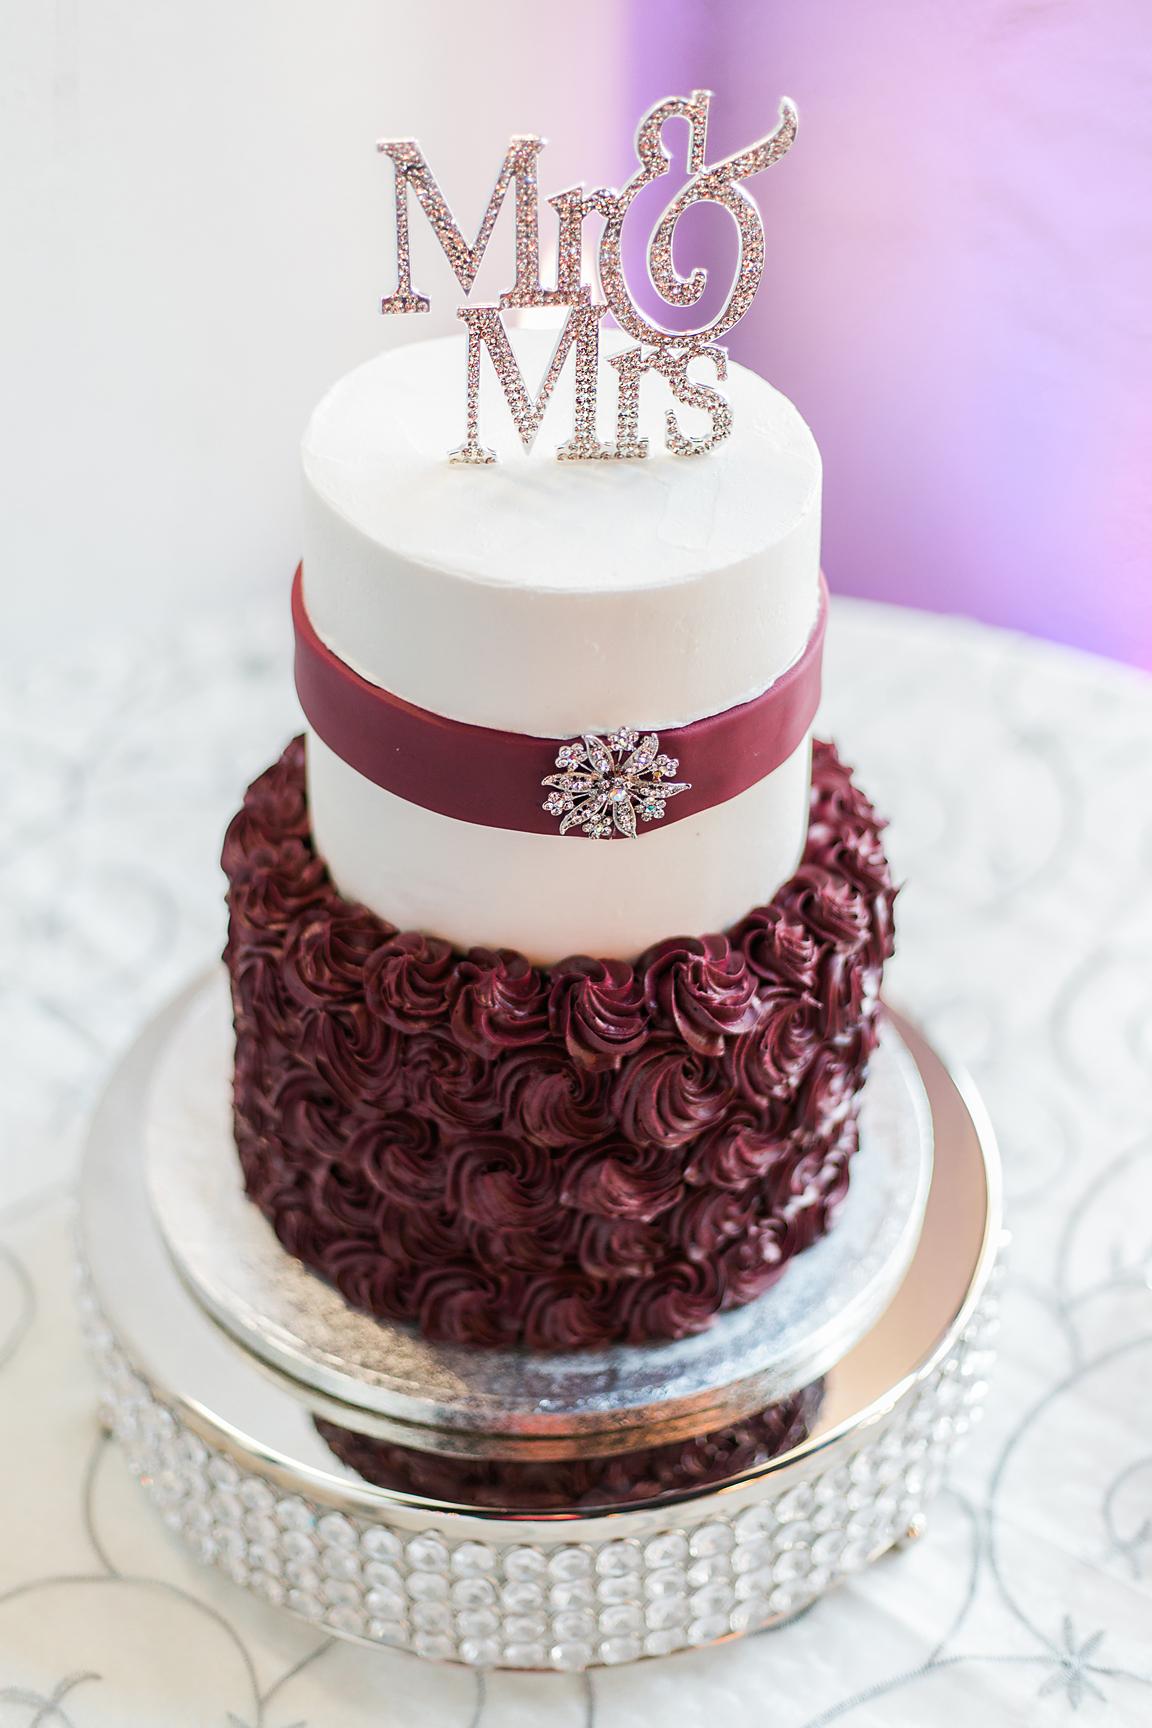 Christina and Sonny - Ybor Wedding Photography - Sarasota Destination Wedding Photography - Reception Photos - Emily & Company Photography (8) copy.jpg